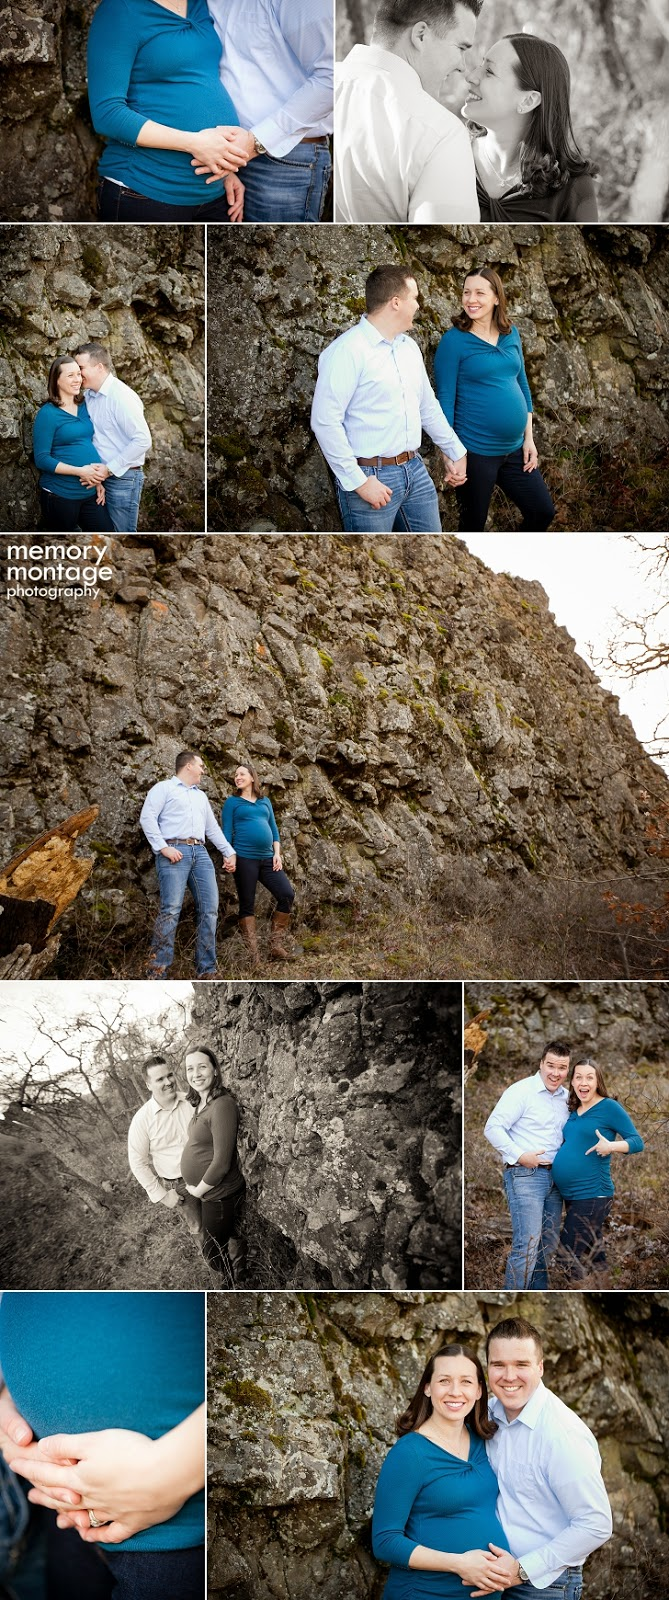 Yakima Area Family Photographer Memory Montage Maternity Session